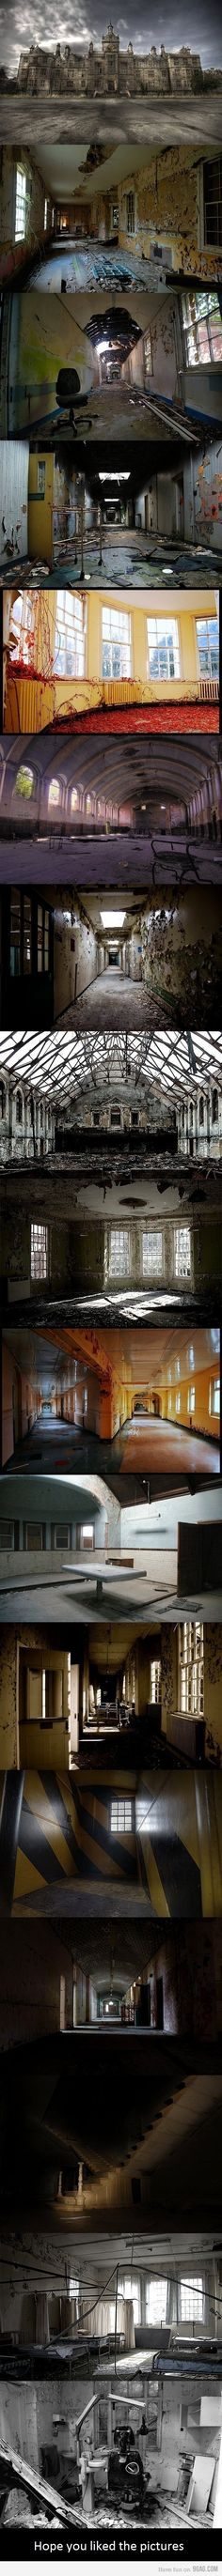 Abandoned mental asylum: Denbigh Asylum, Dinbych, Wales.  Built mid 1840s, closed 1995.